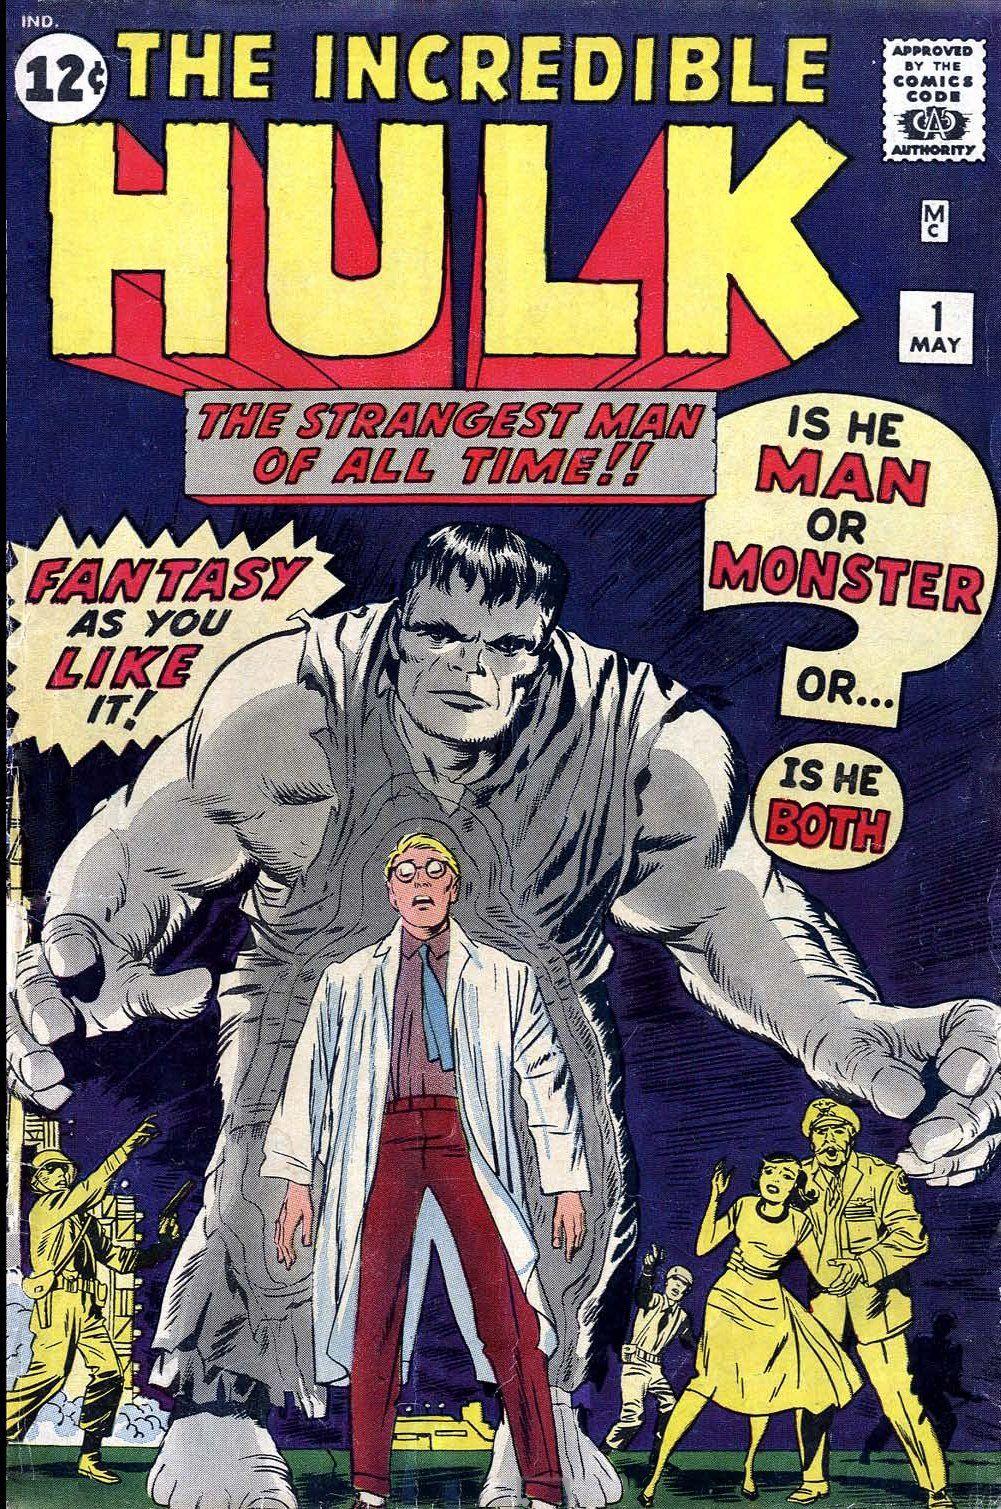 Marvel's THE INCREDIBLE HULK #1